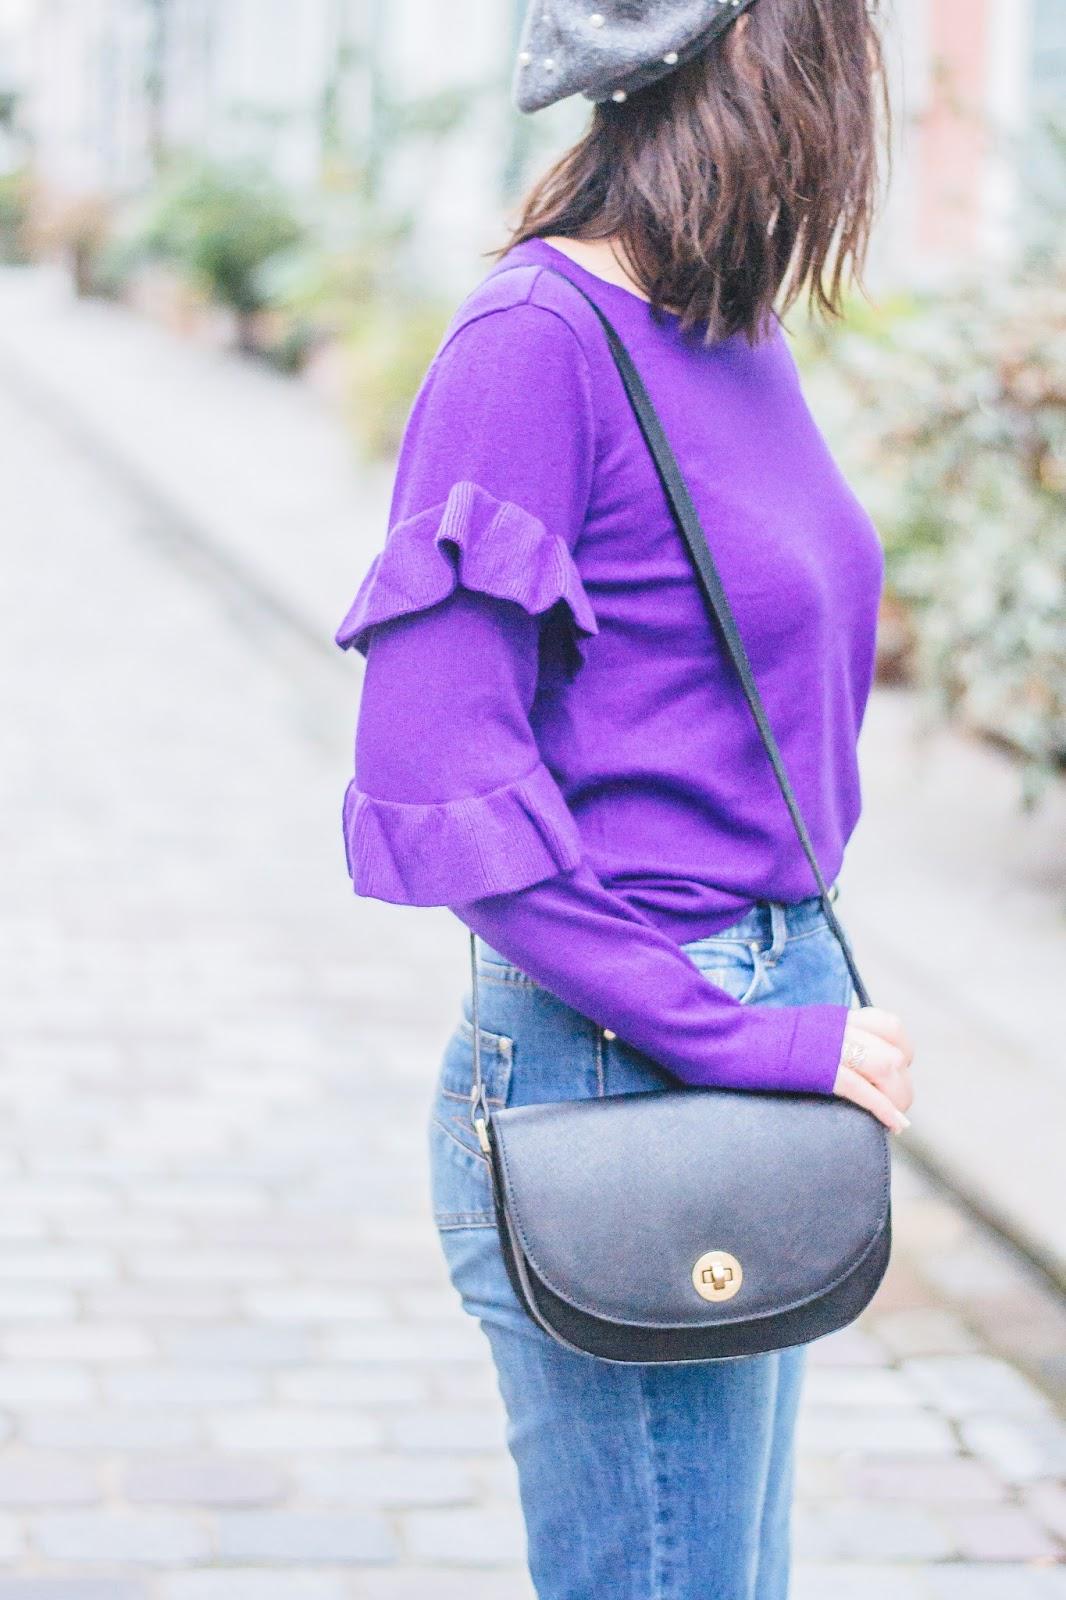 sacsabrina - Purple Sweater and Vibrant Homes